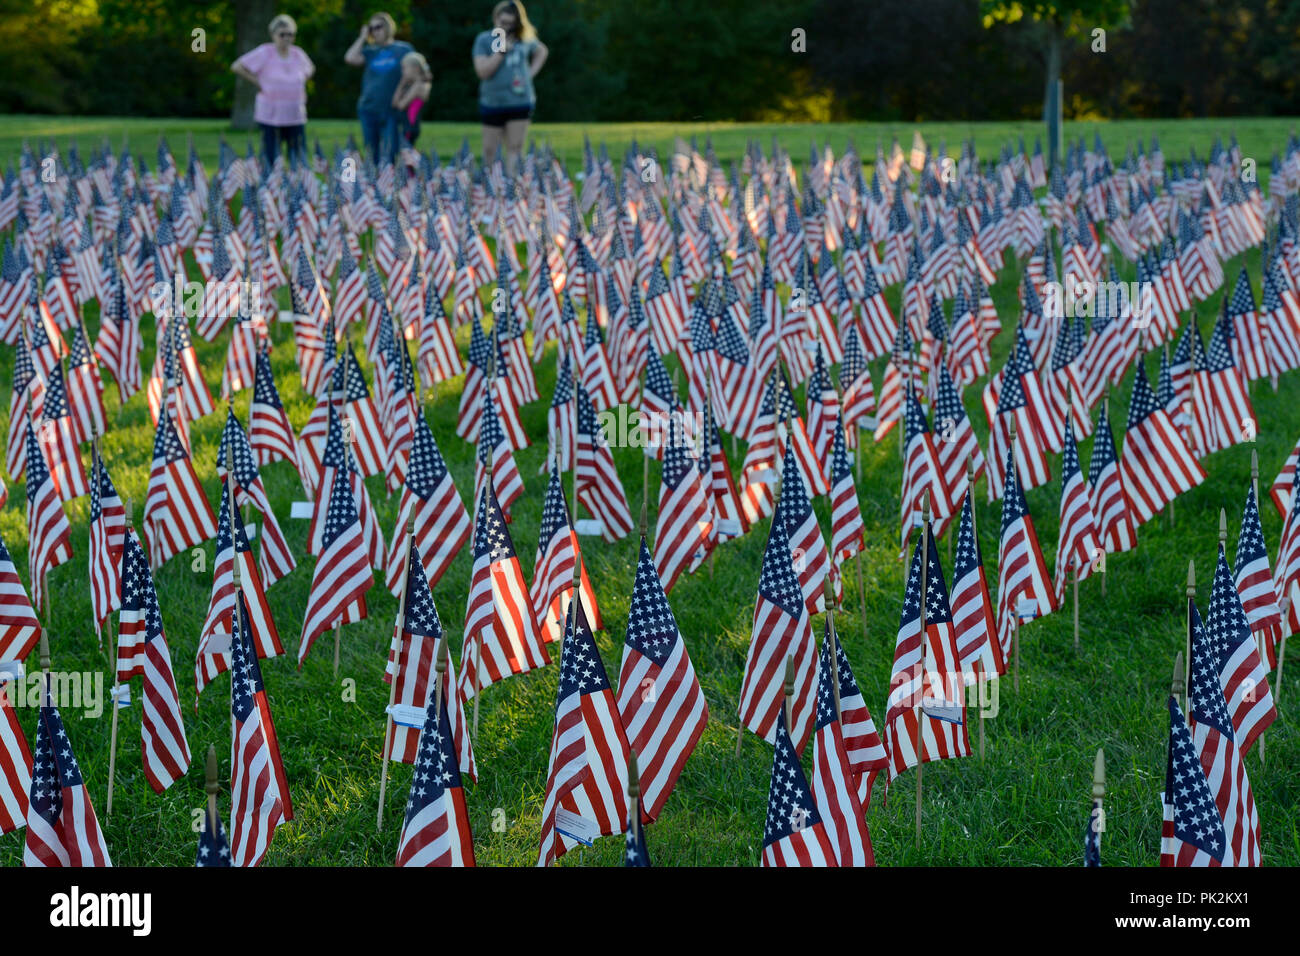 Omaha, Nebraska, USA. 10th September, 2018. Tribute of Flags for memory of the victims of terrorist attack of 9/11, 11th September 2001 at world trade center New York City, ground zero Credit: Joerg Boethling/Alamy Live News - Stock Image